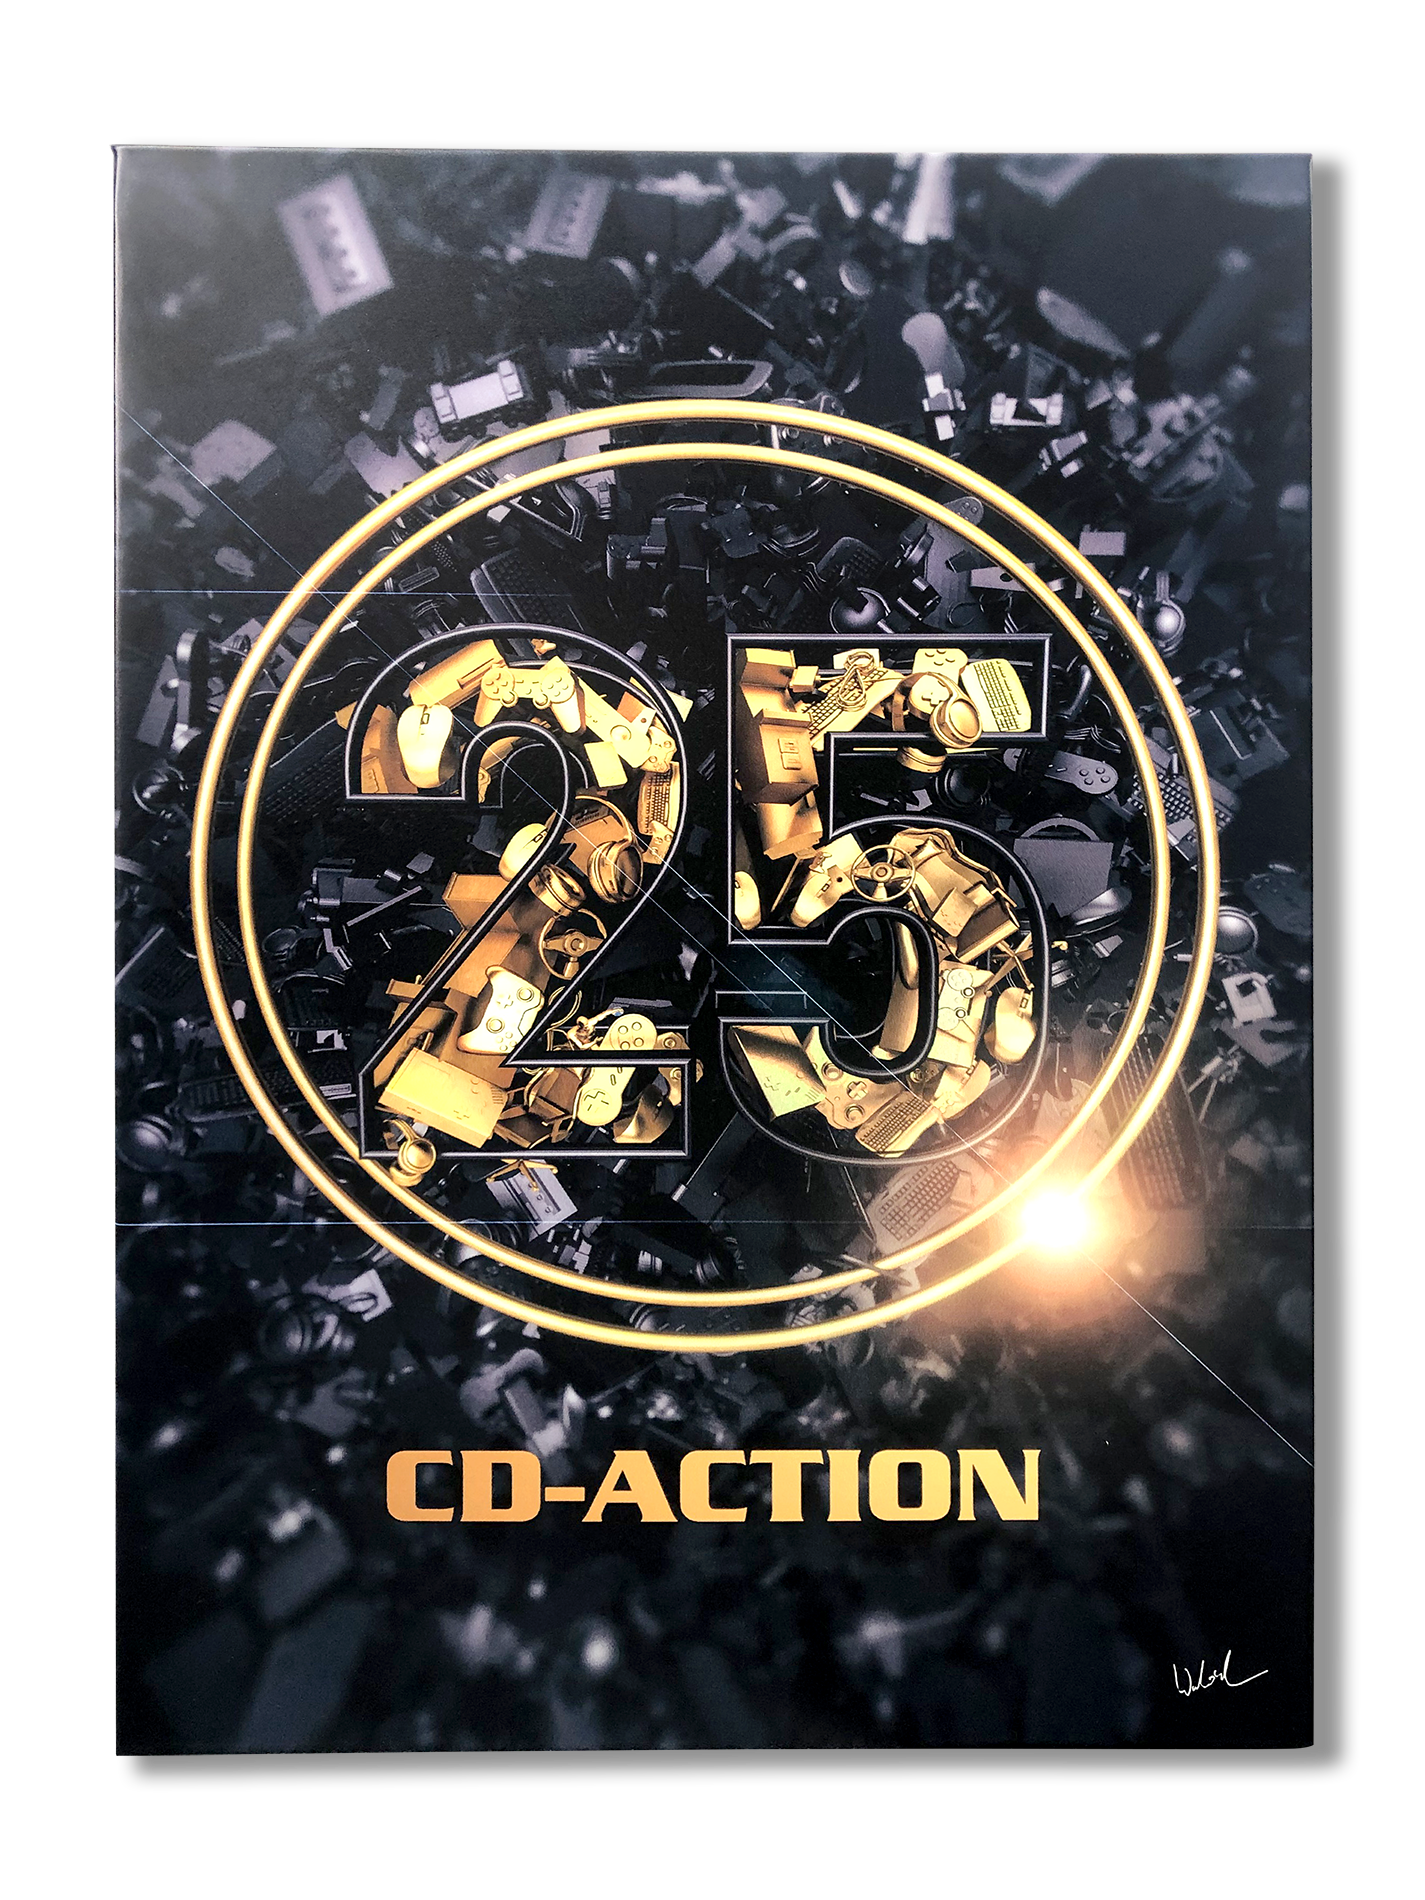 Metalowy plakat 25 lat CD-Action, edycja limitowana,blacha